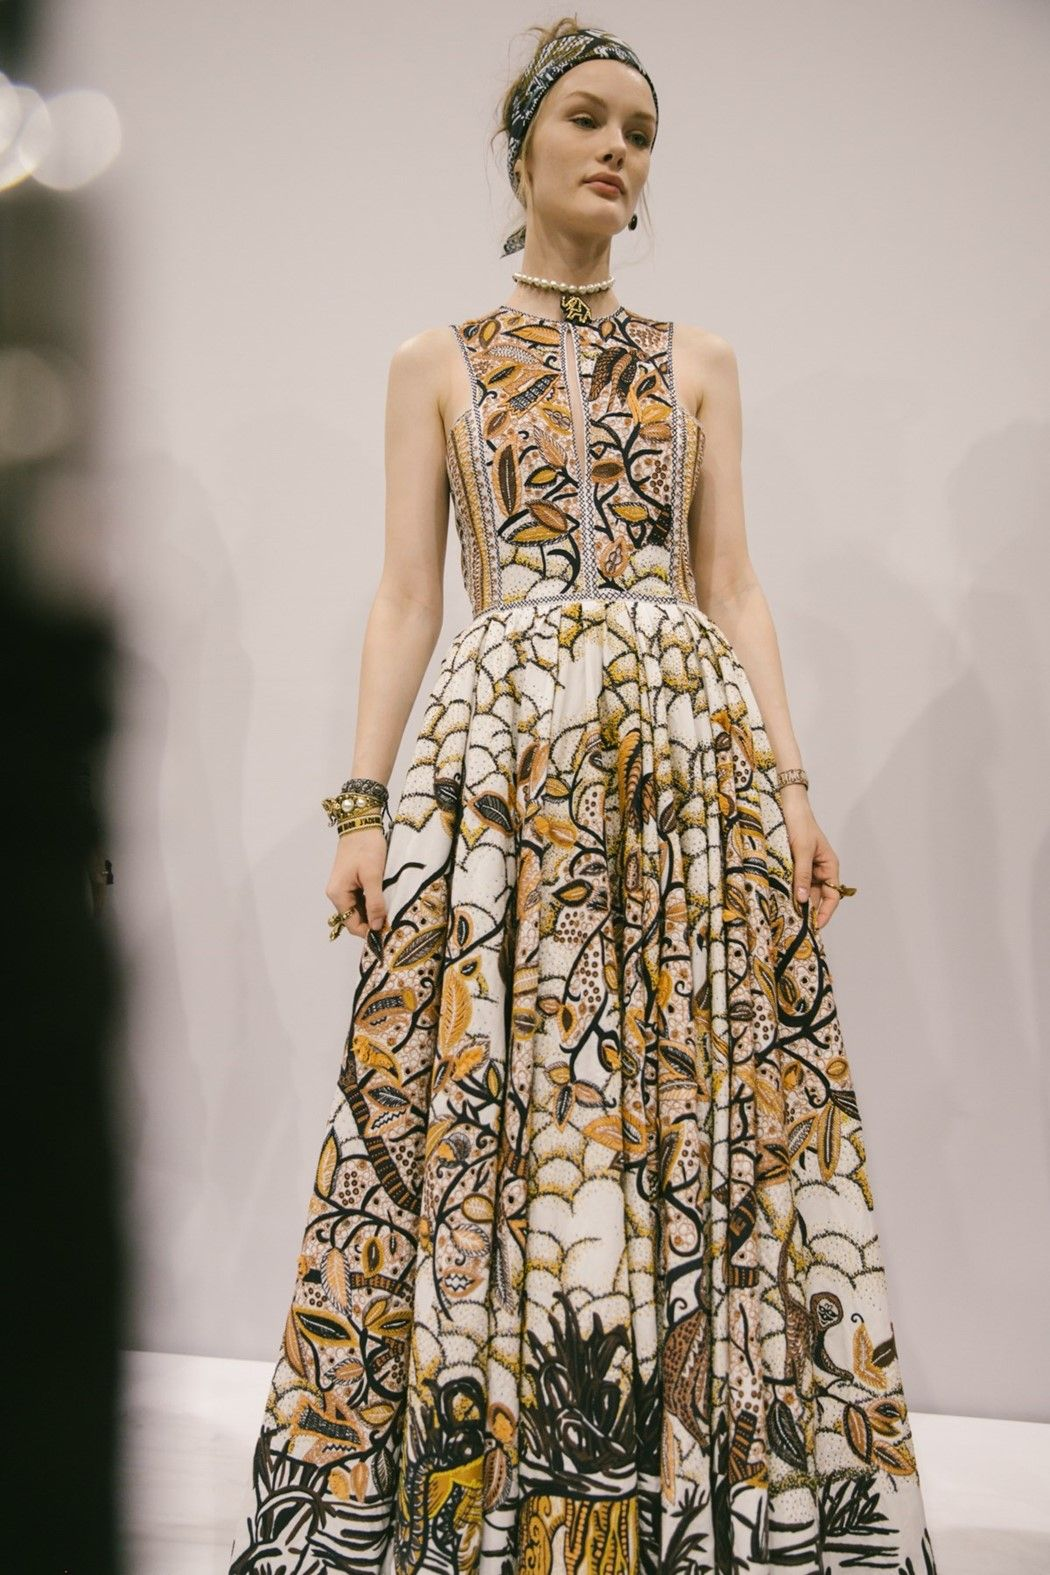 Christian Dior Cruise 2020 2019 Elbise Modelleri